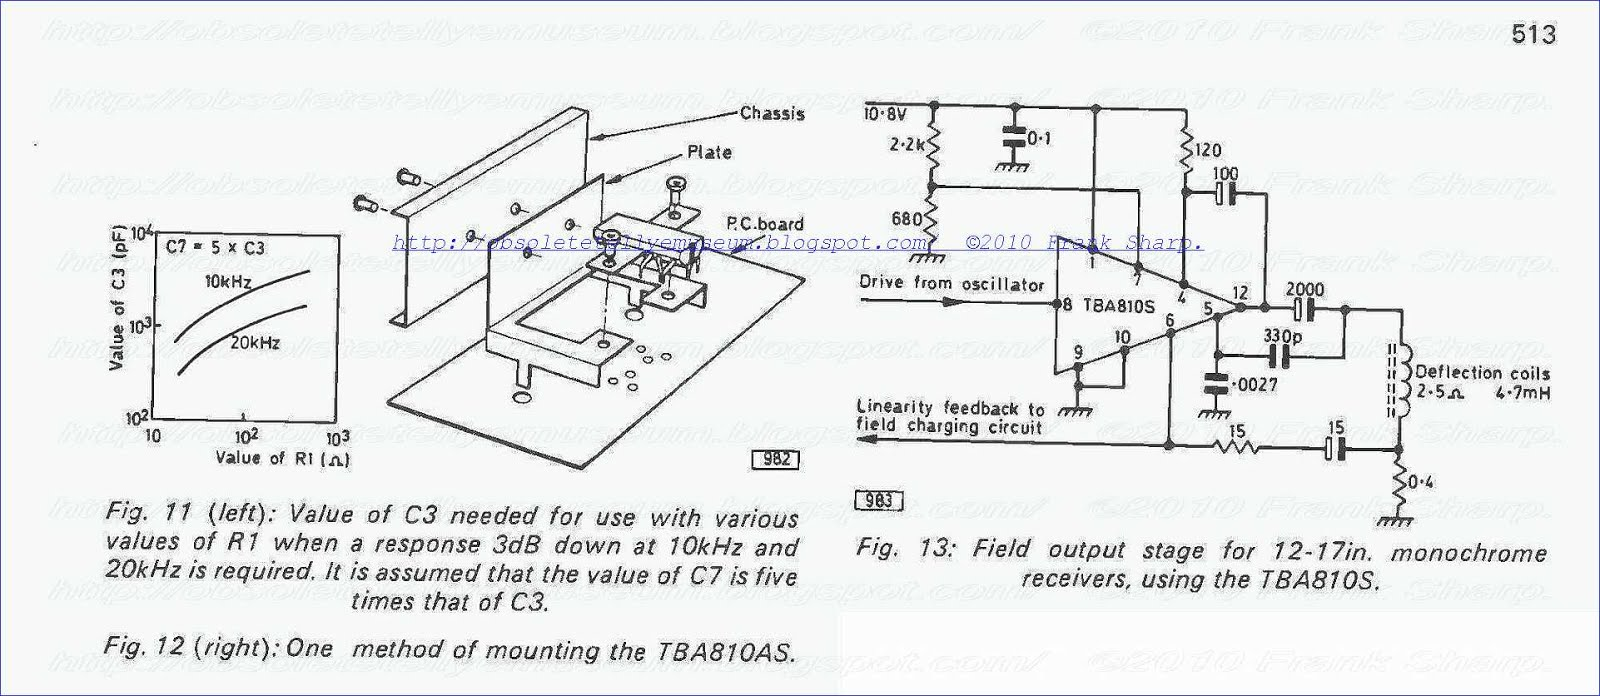 hight resolution of obsolete technology tellye itt schaub lorenz ideal color 1844 at wiring diagram for jacobs ultra